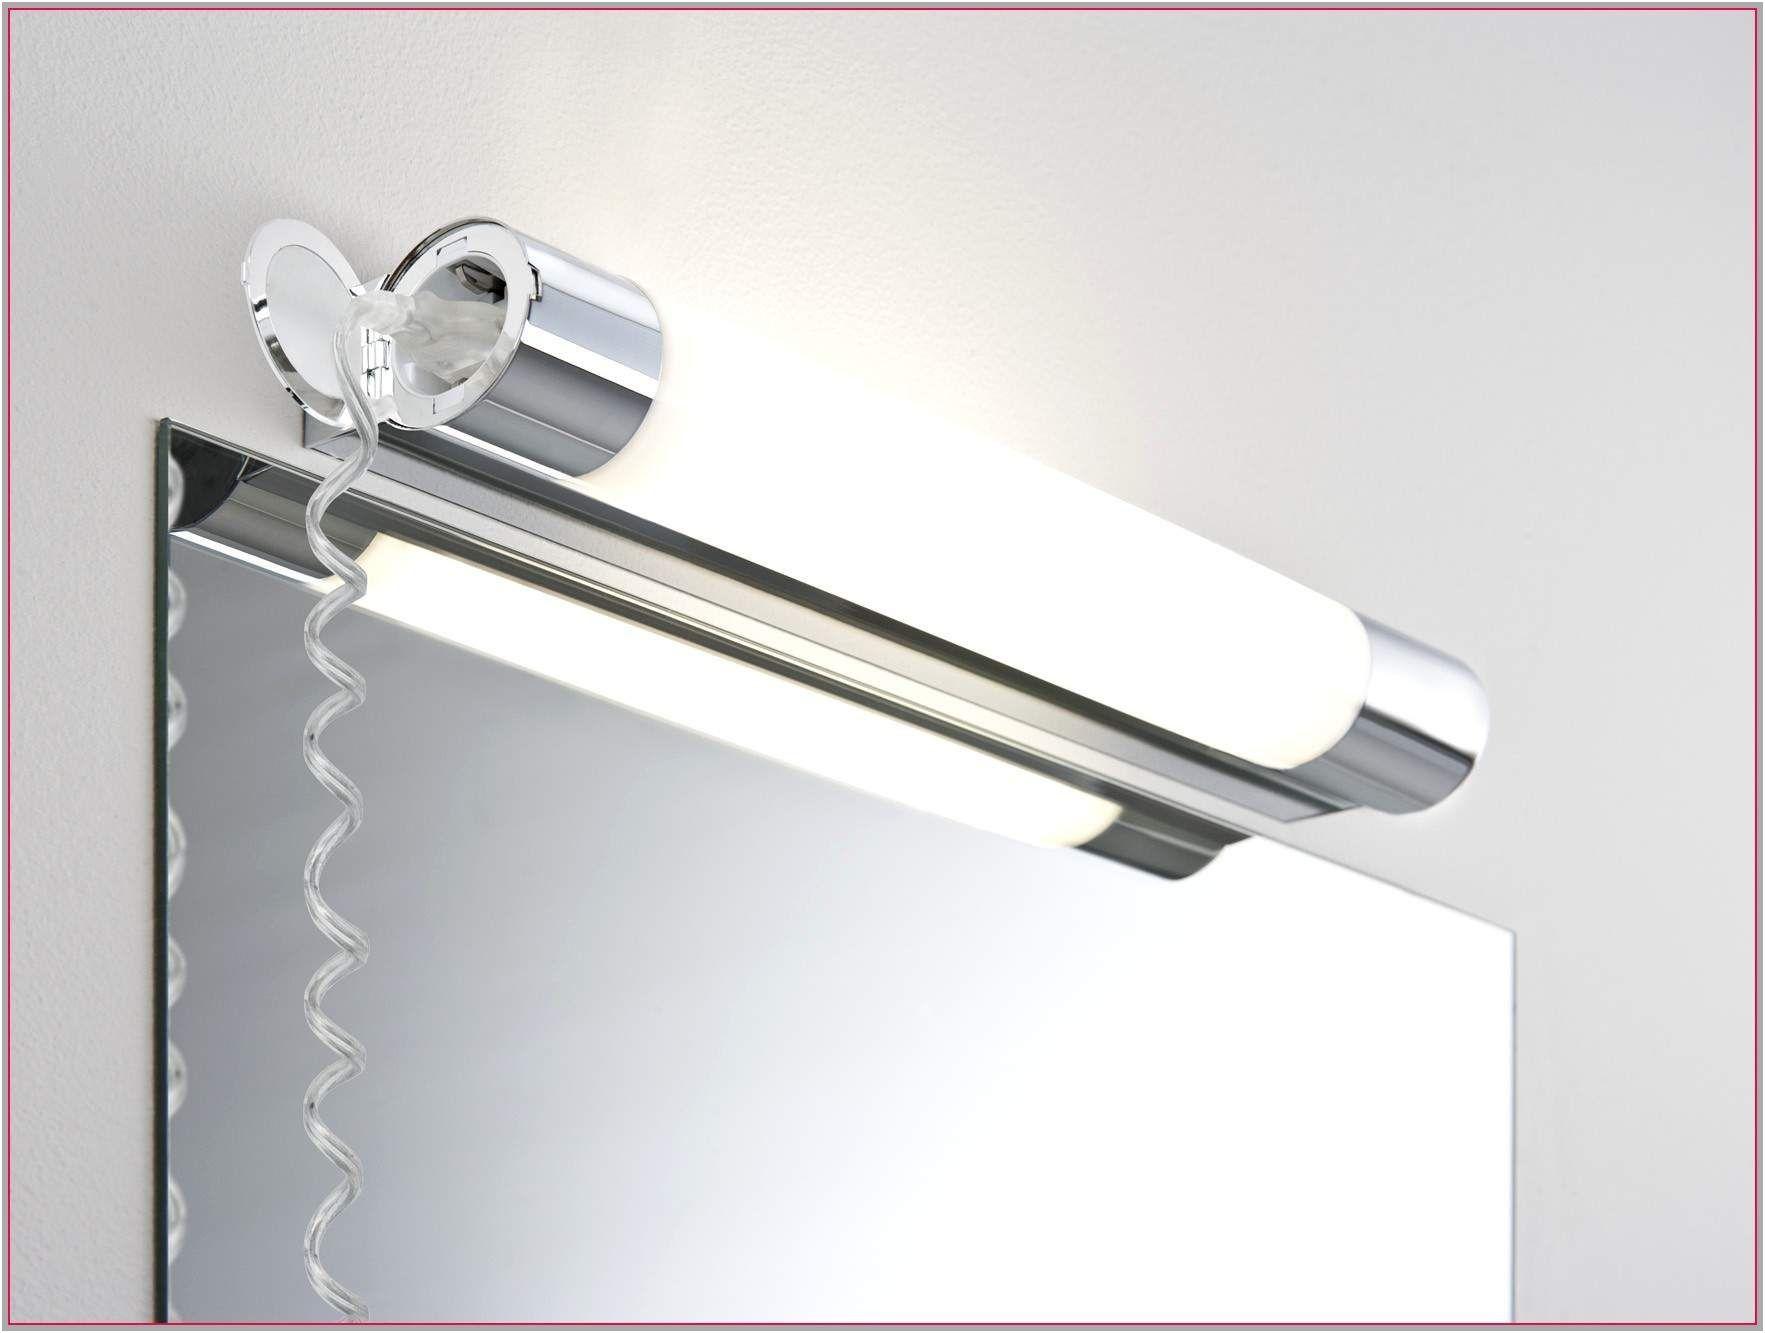 Tips to Create Lampe Salle De Bains Ikea